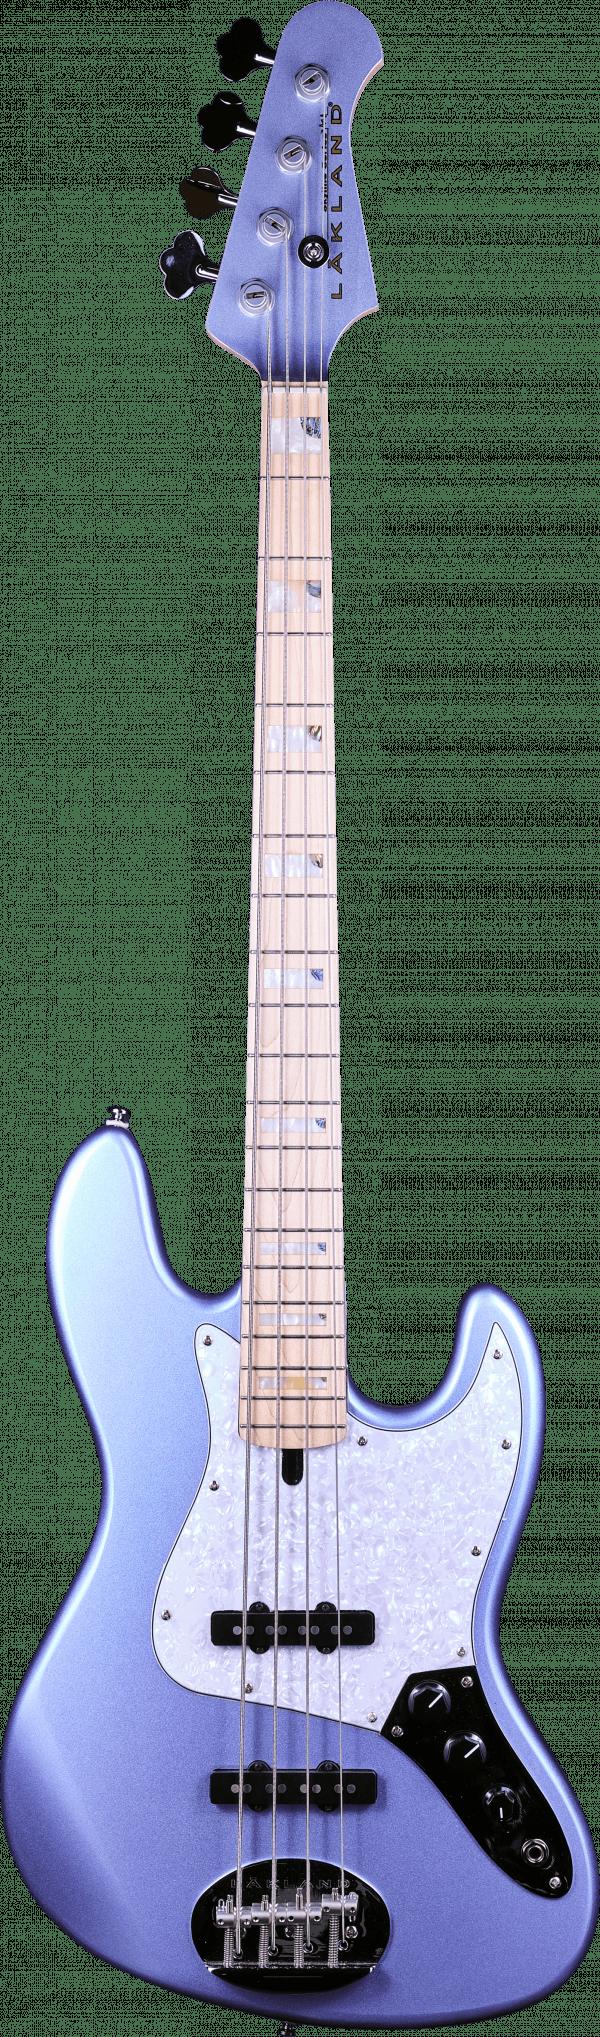 Lakland Skyline 44-60 Jazz Custom Ice Blue Metallic